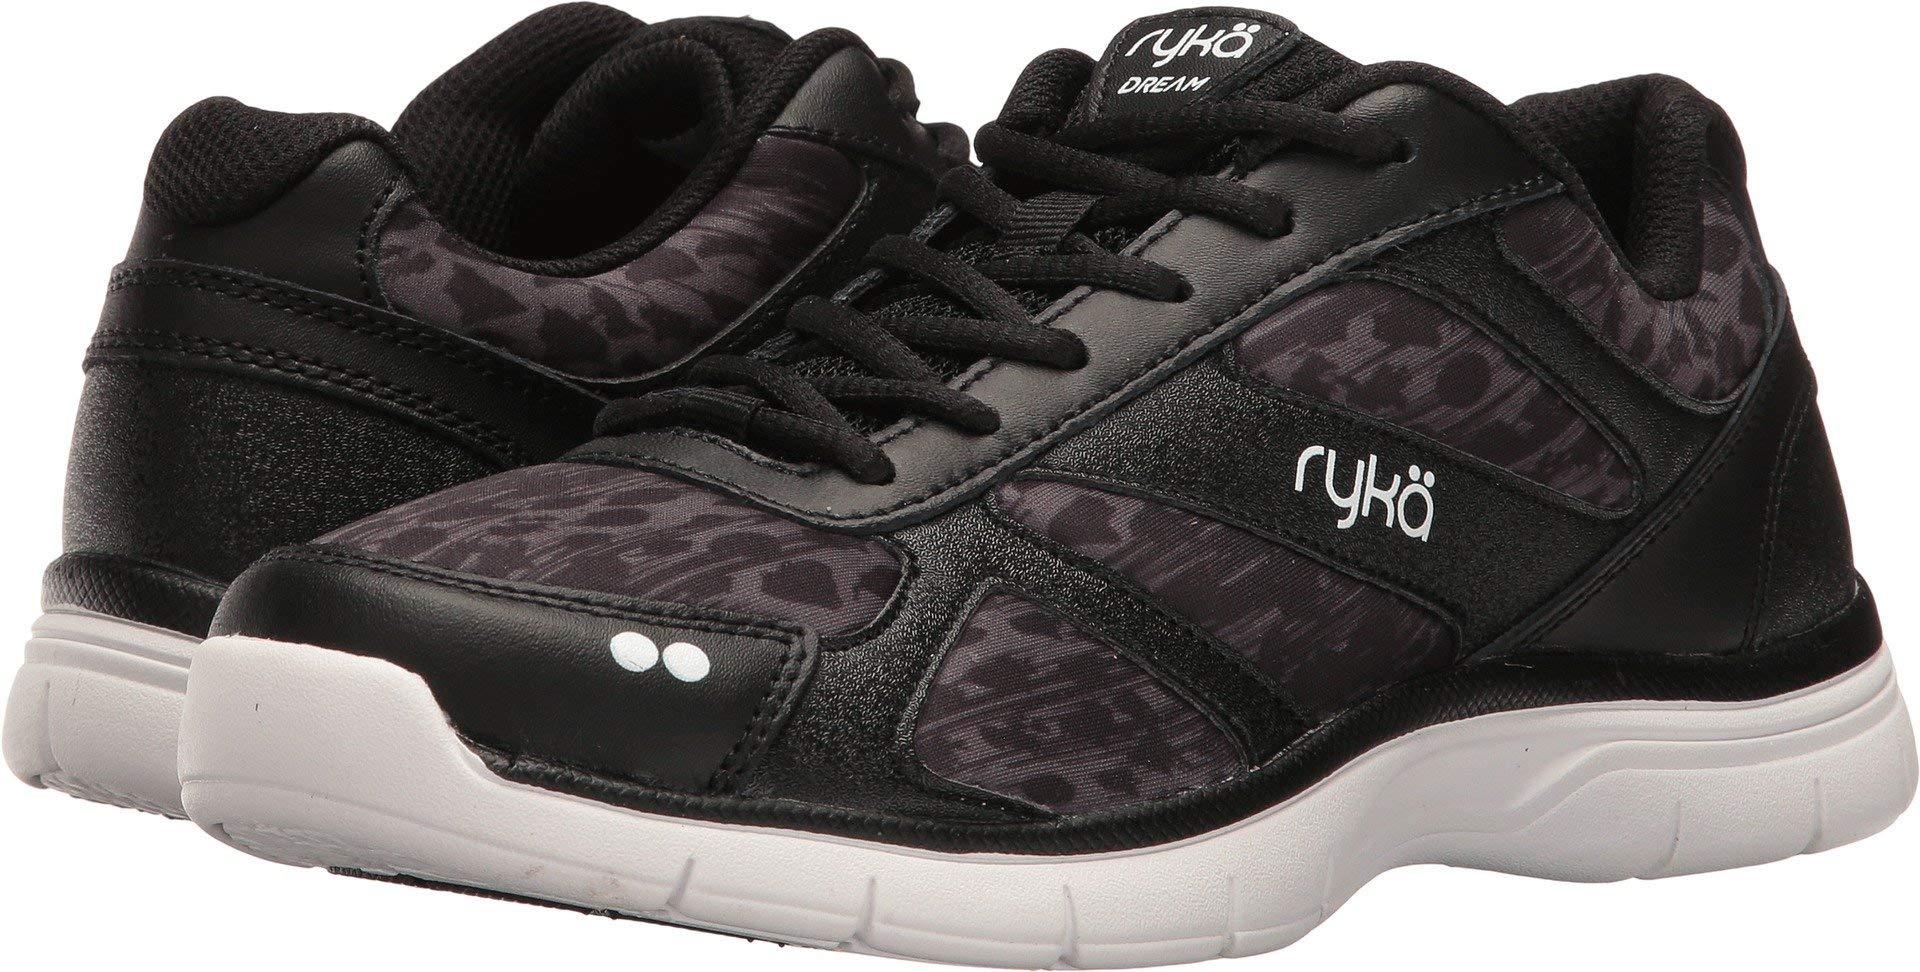 Ryka Women's Dream SMT Black/Iron Grey/White 11 B US by Ryka (Image #1)